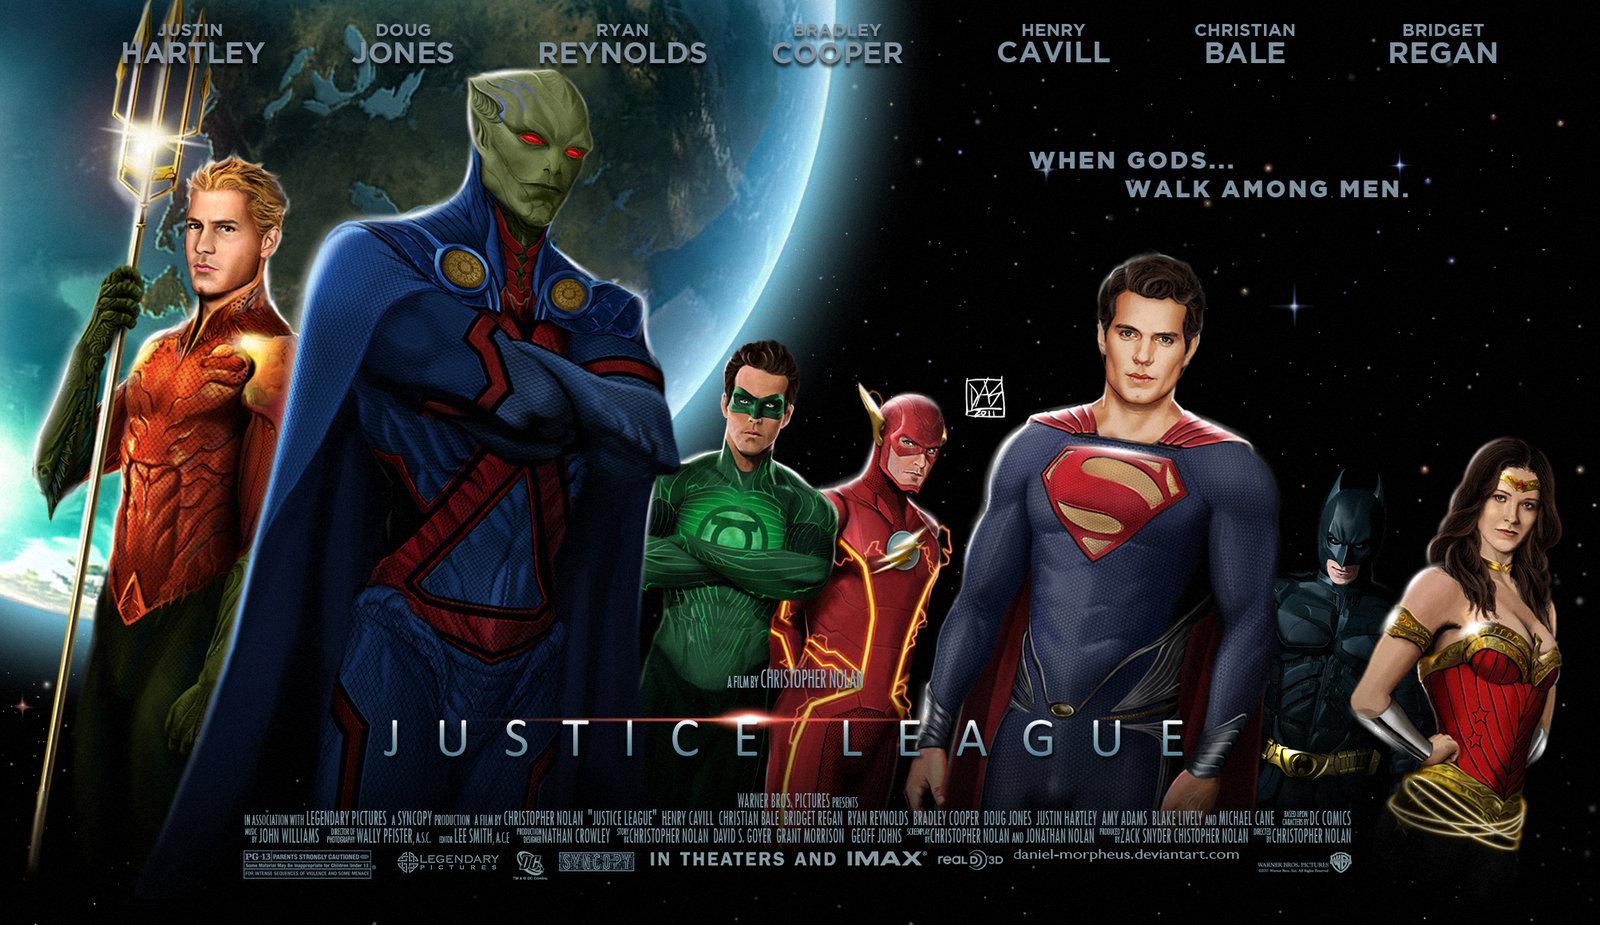 2343760-justice_league_movie_poster_by_daniel_morpheus_d4ga8dj.jpg